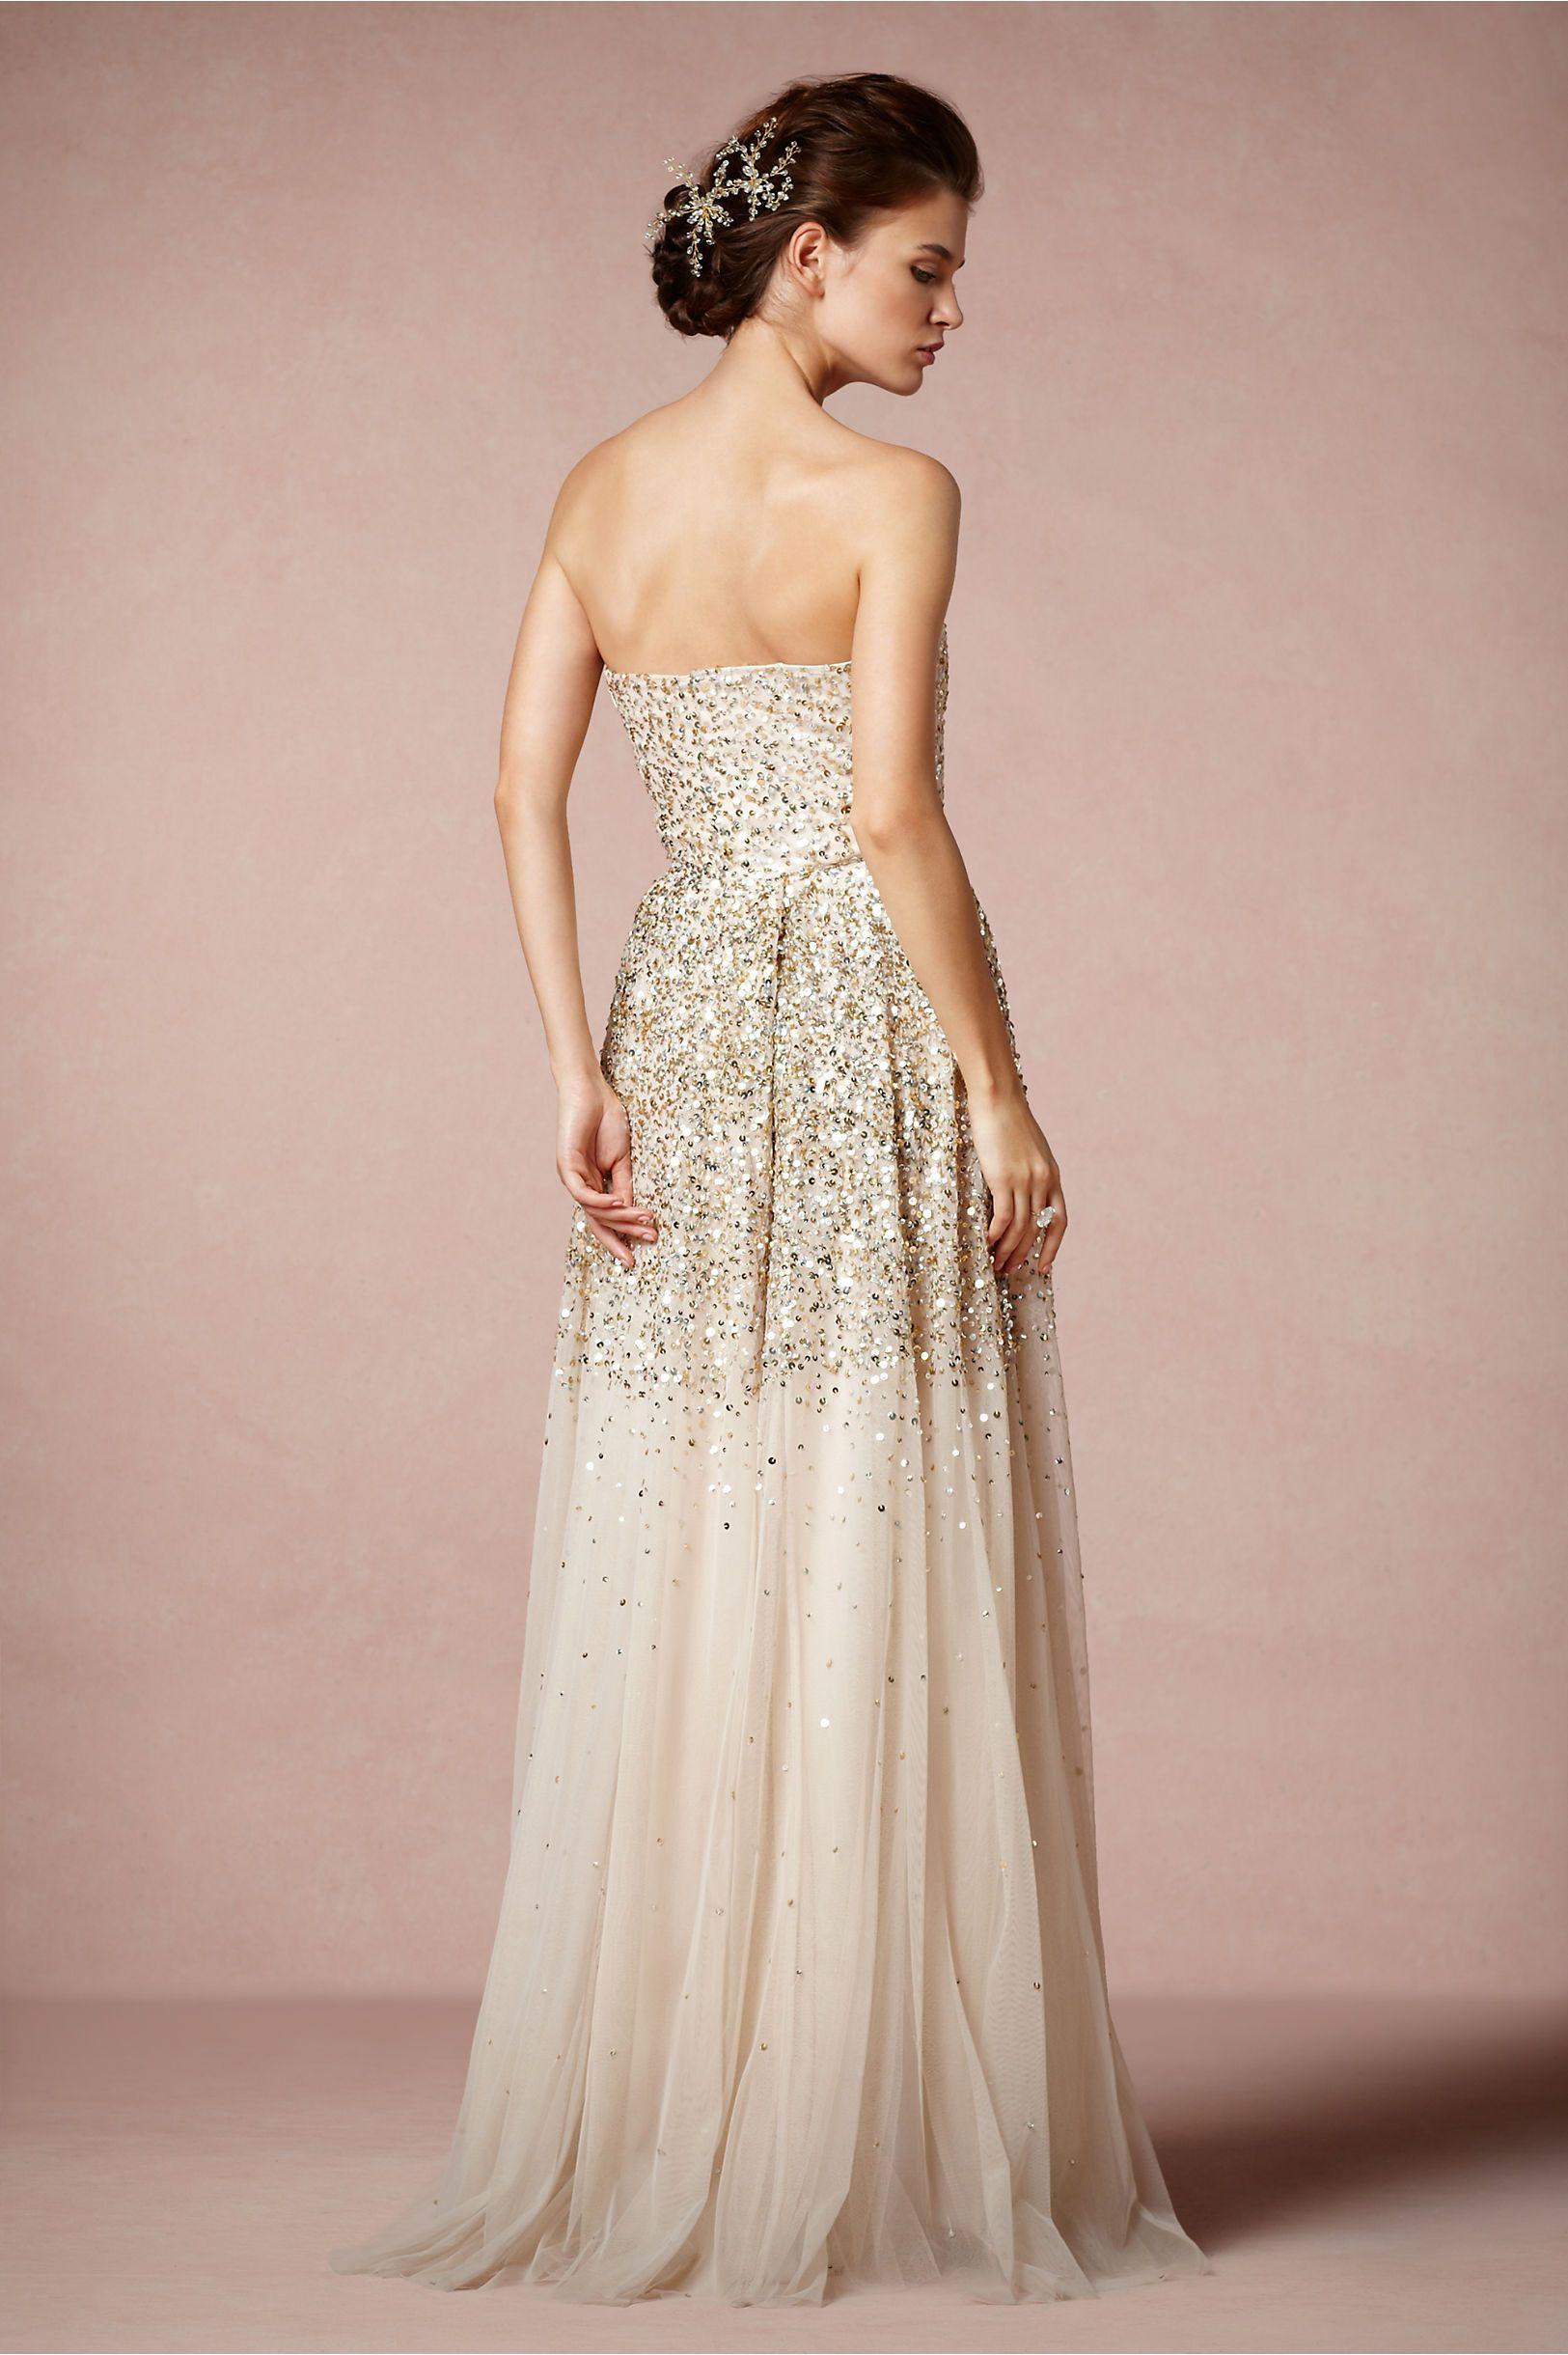 Isadora Gown in The Bride Wedding Dresses at BHLDN | de blanco ...